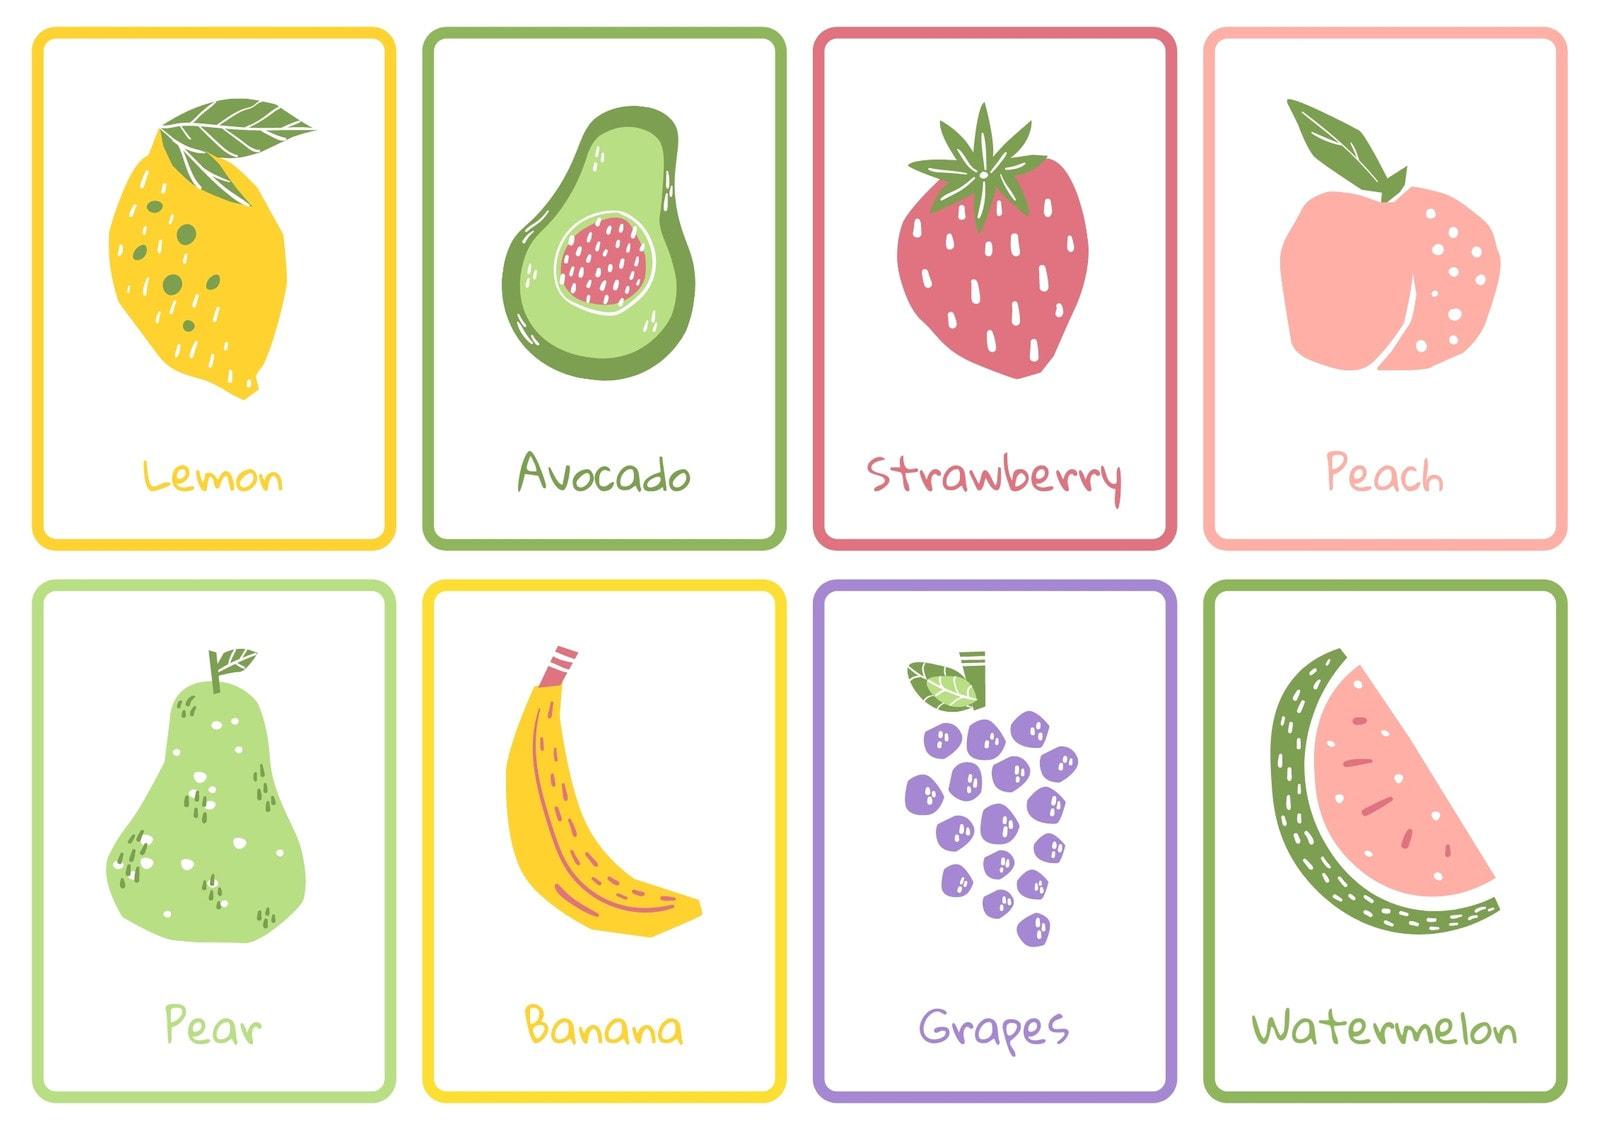 Fruits Colorful Handdrawn Flashcard Sheets